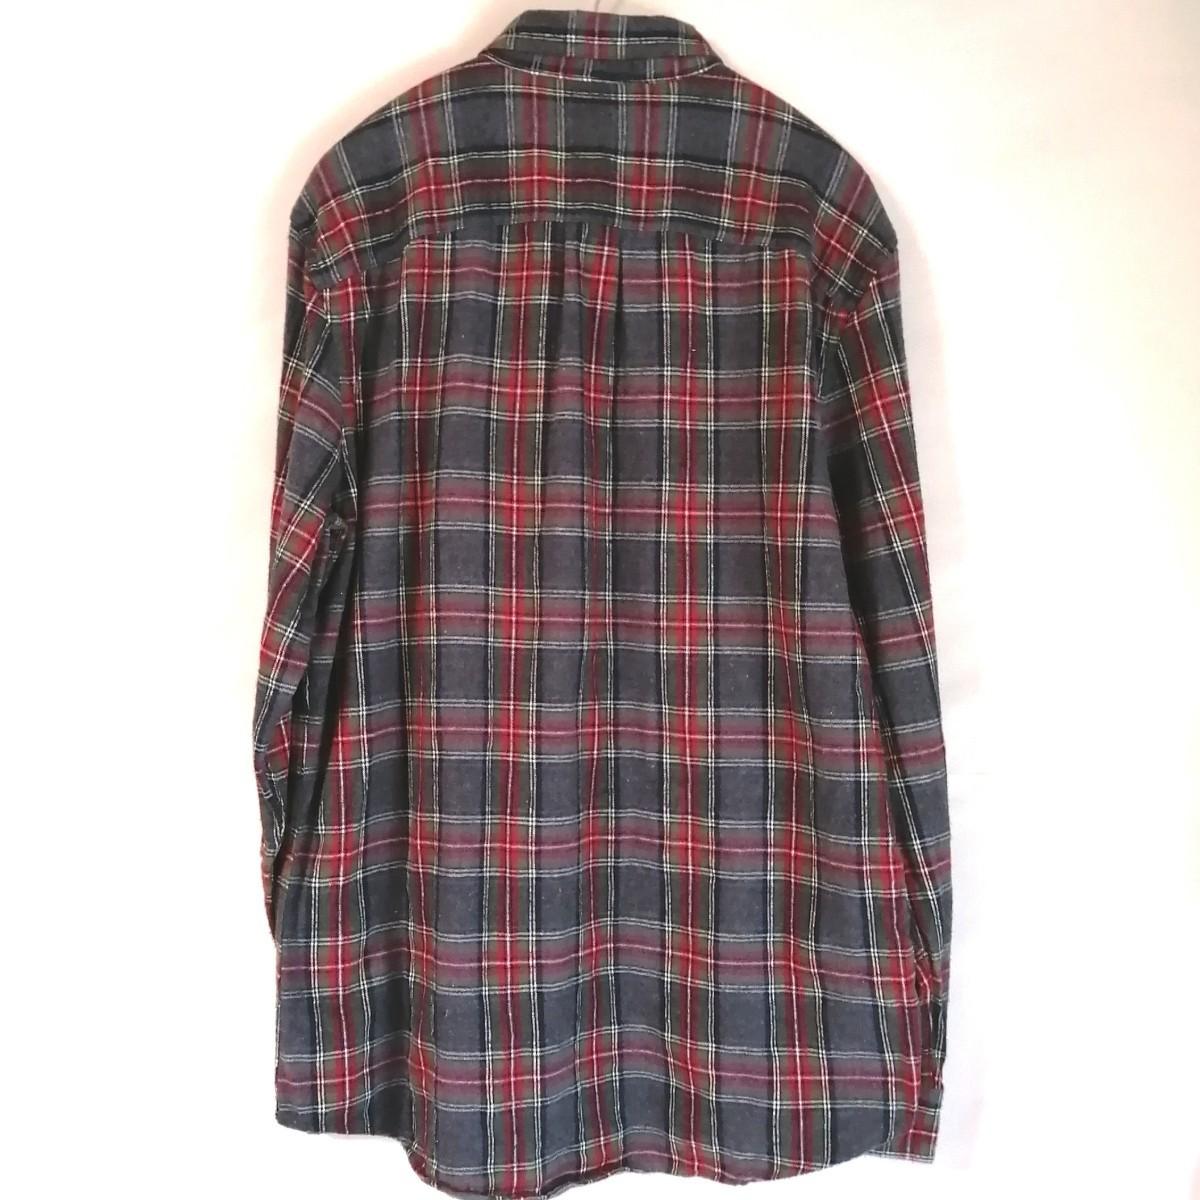 L.L.Bean チェックシャツ ネルシャツ